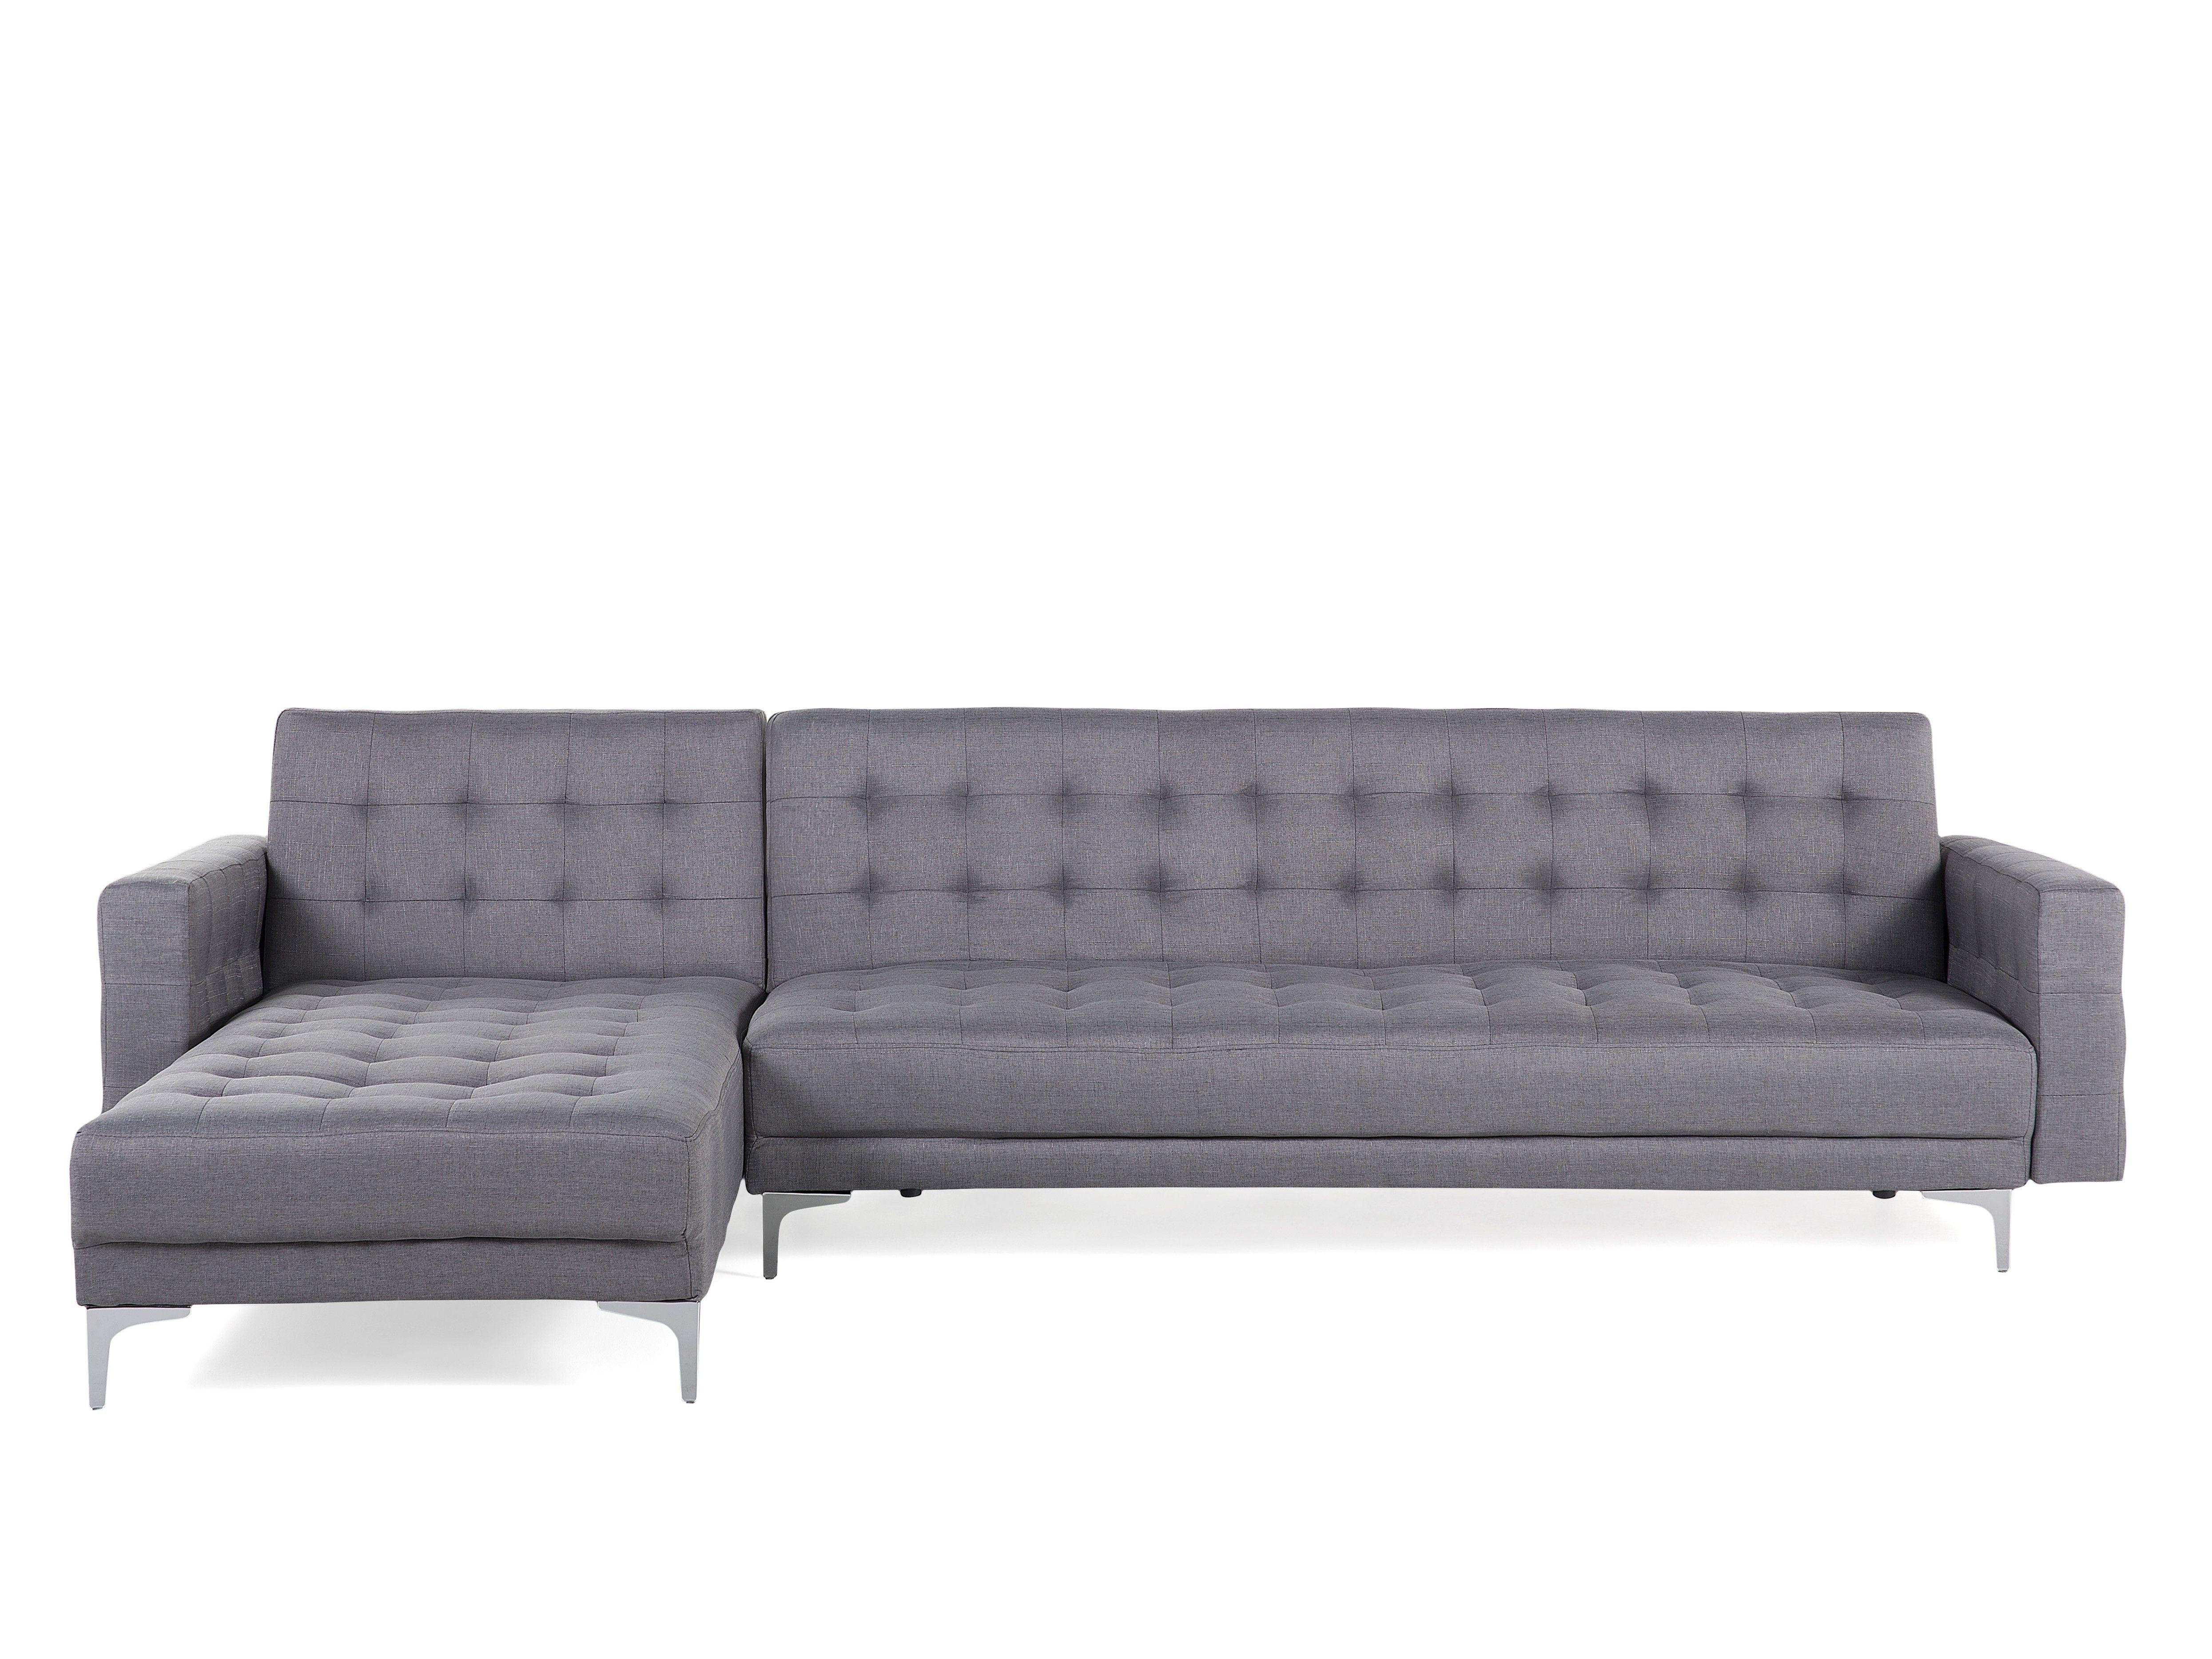 Weitlaufig Couch Samt Corner Sofa Bed Sofa Sofa Bed